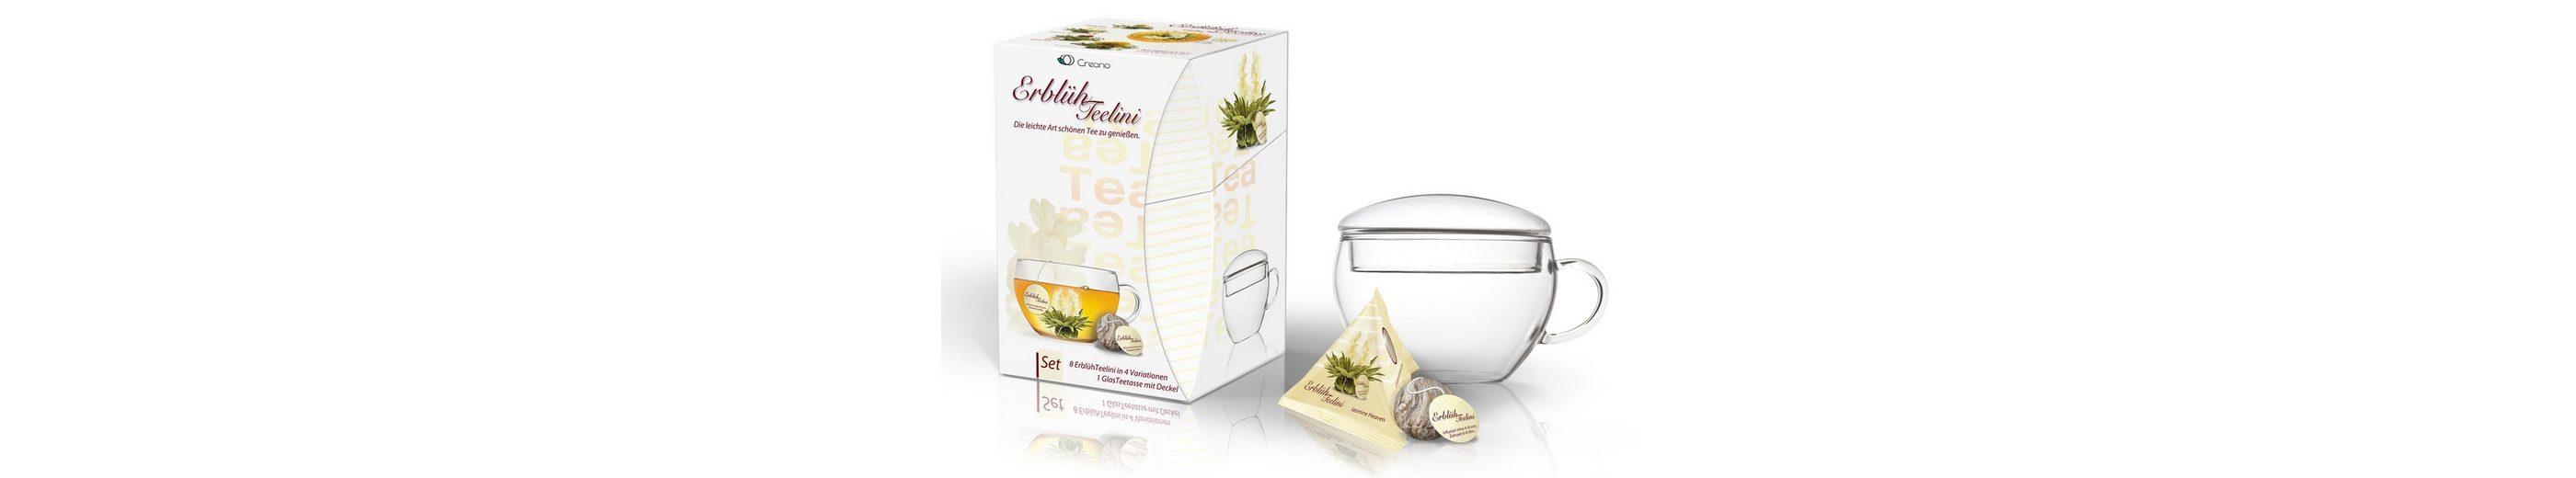 Creano Erblüh-Teelini Geschenk-Set, »Weißer Tee«